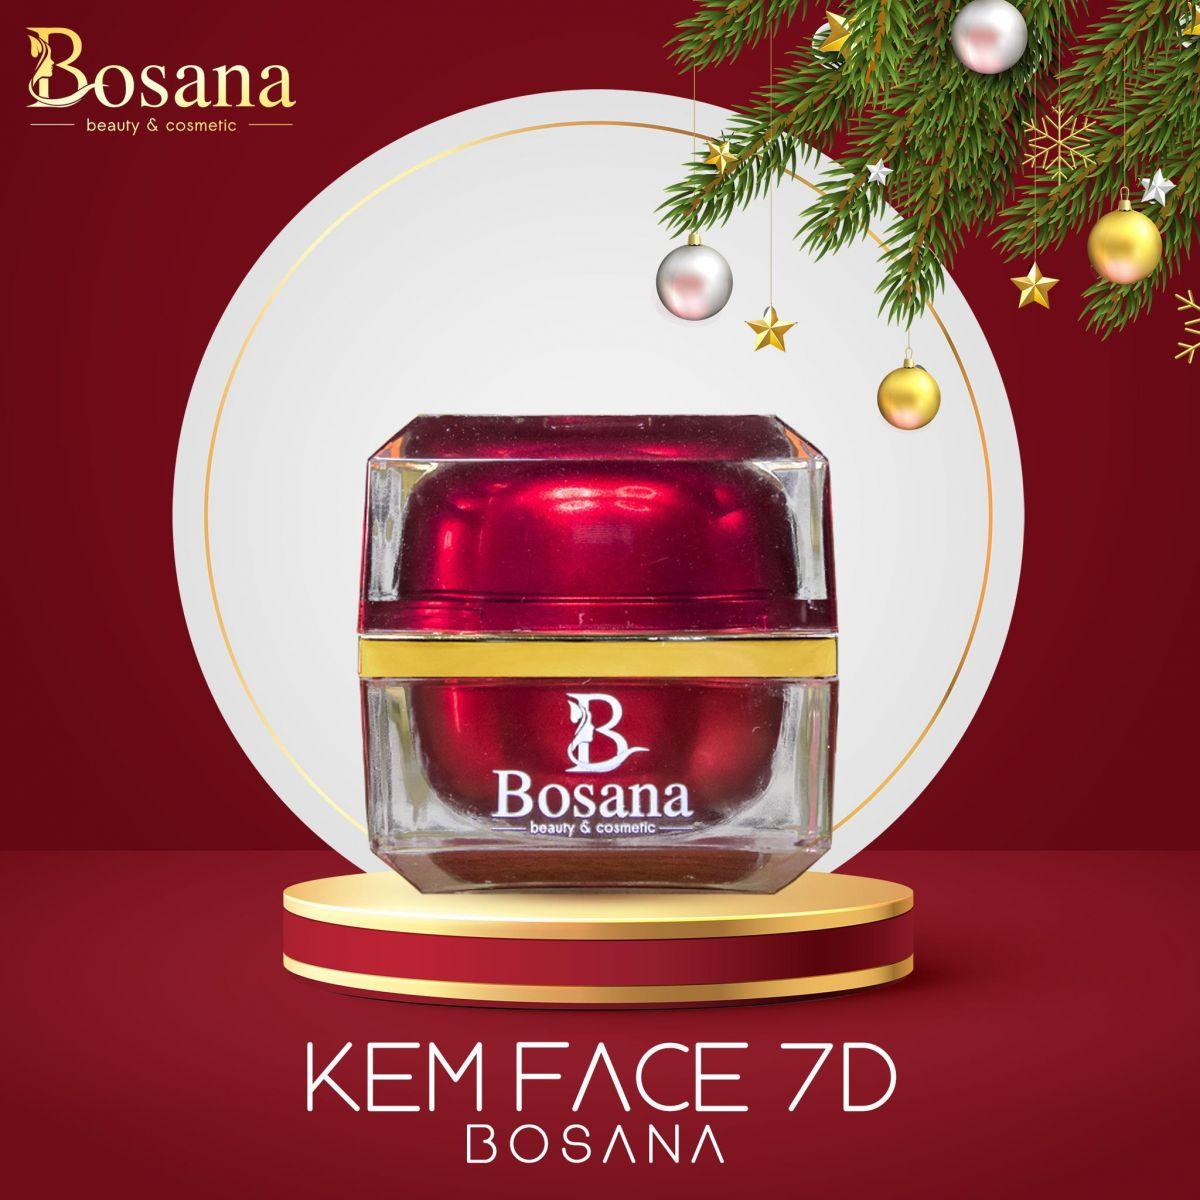 Kem Face 7D Bosana